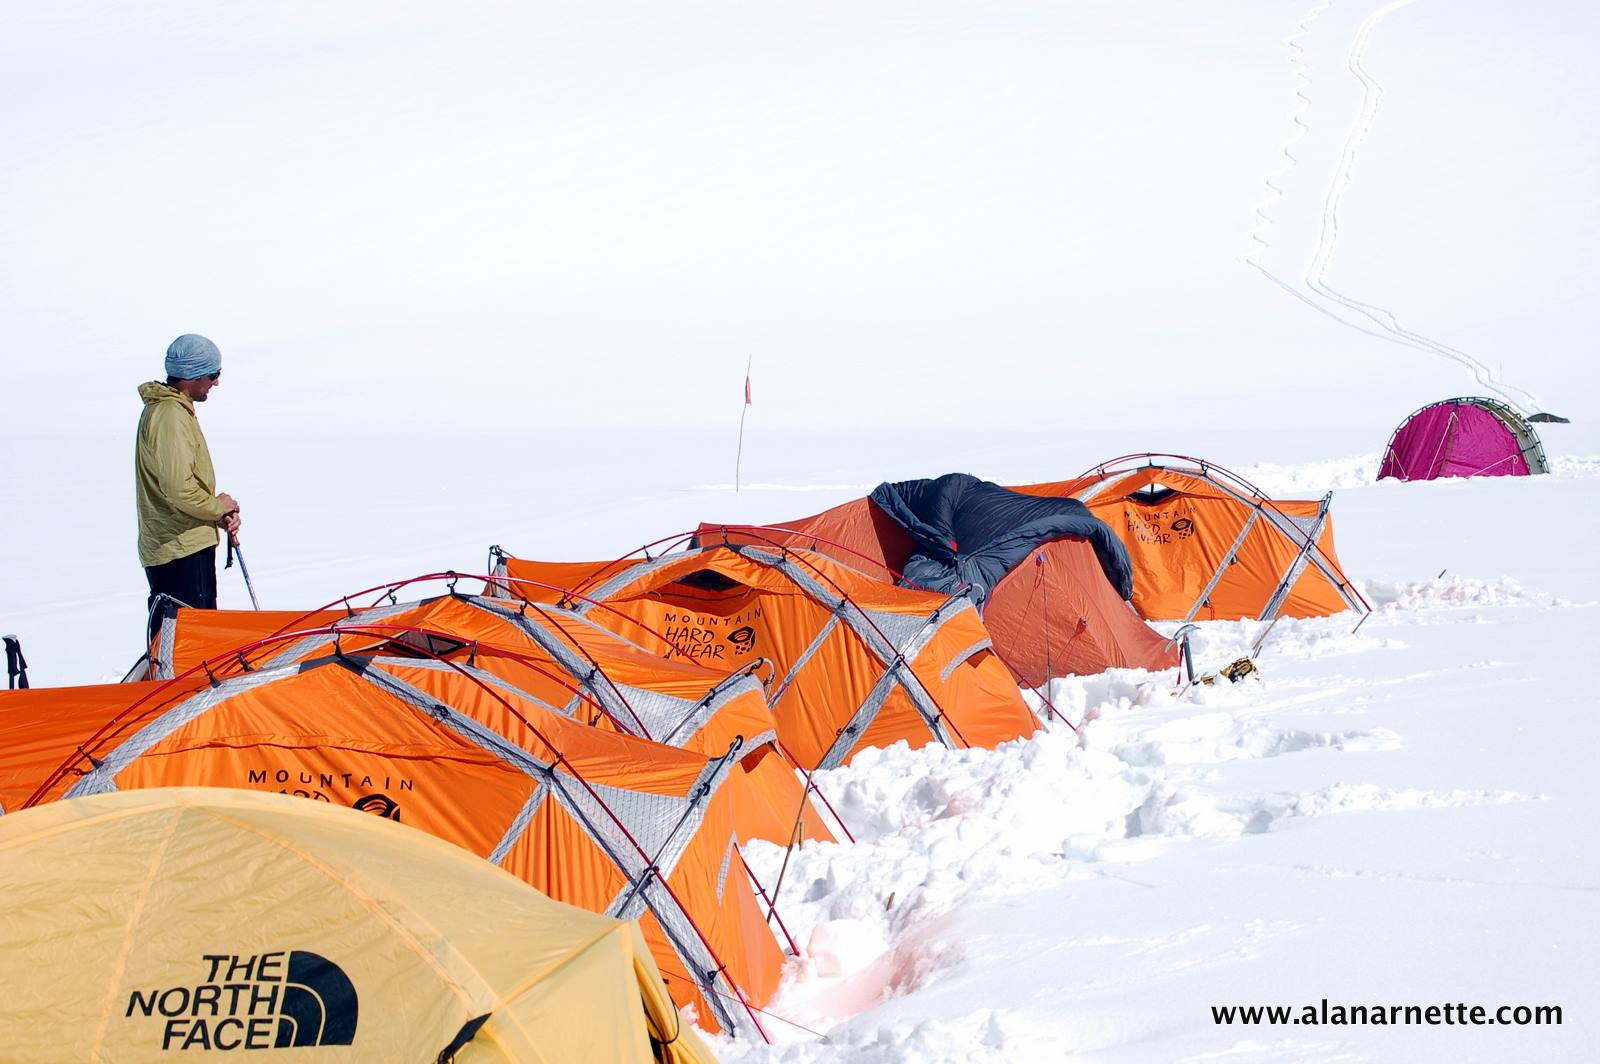 Camp 2 at 7100m or 23,300 feet on Shishapangma (26,335 feet 8,027 meters) in 2007.